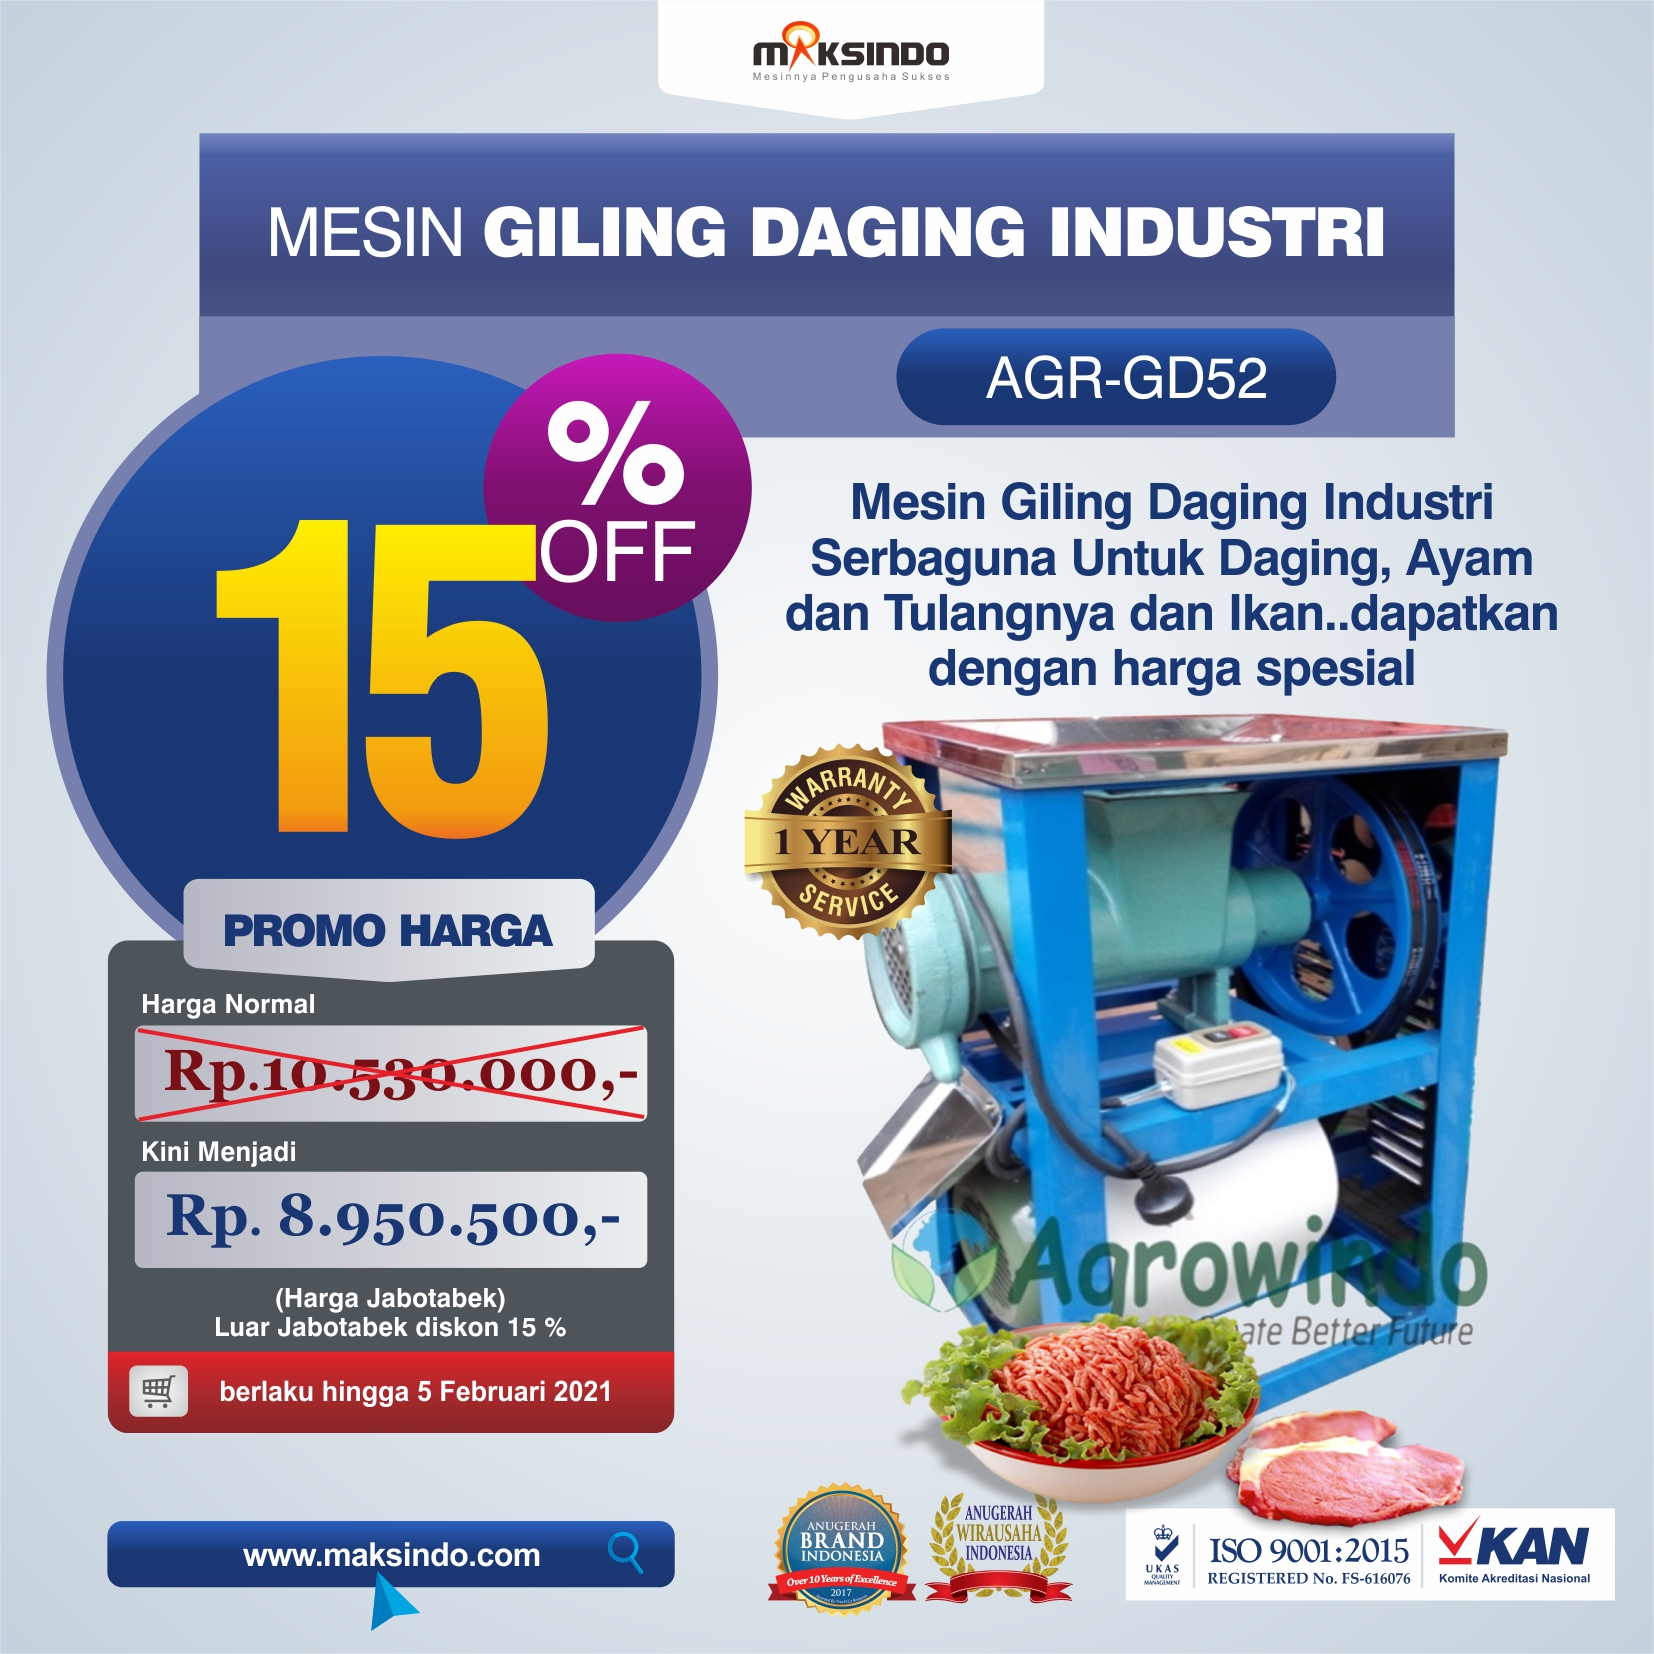 Jual Mesin Giling Daging Industri (AGR-GD52) di Yogyakarta